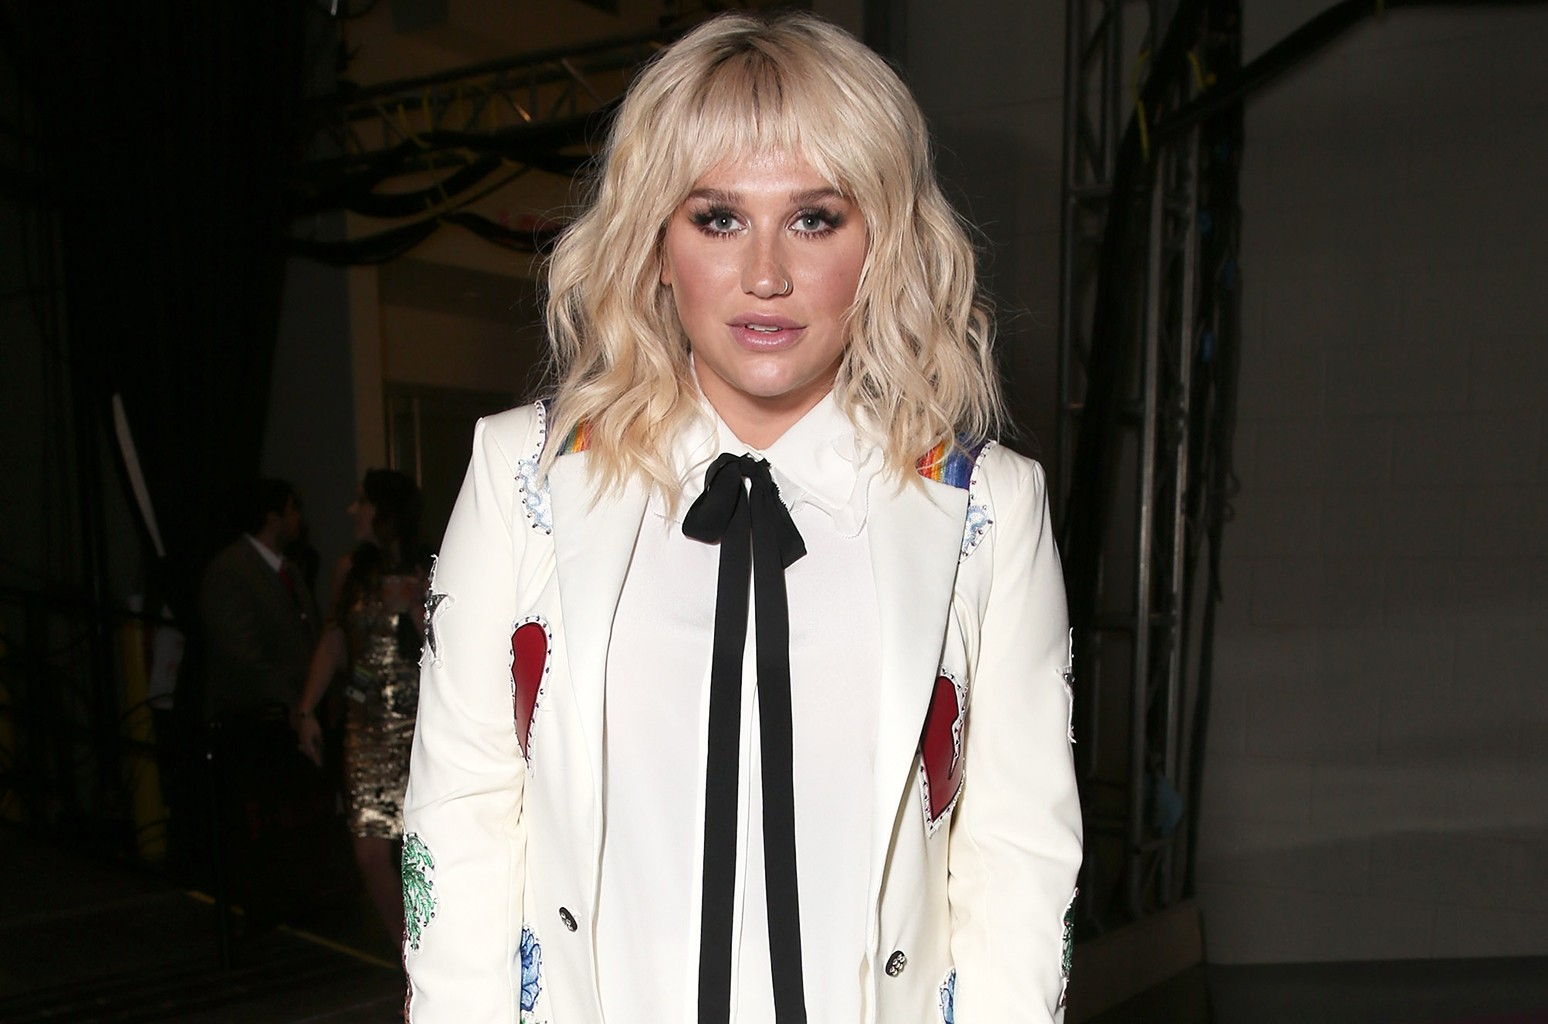 Kesha backstage at the 2016 Billboard Music Awards